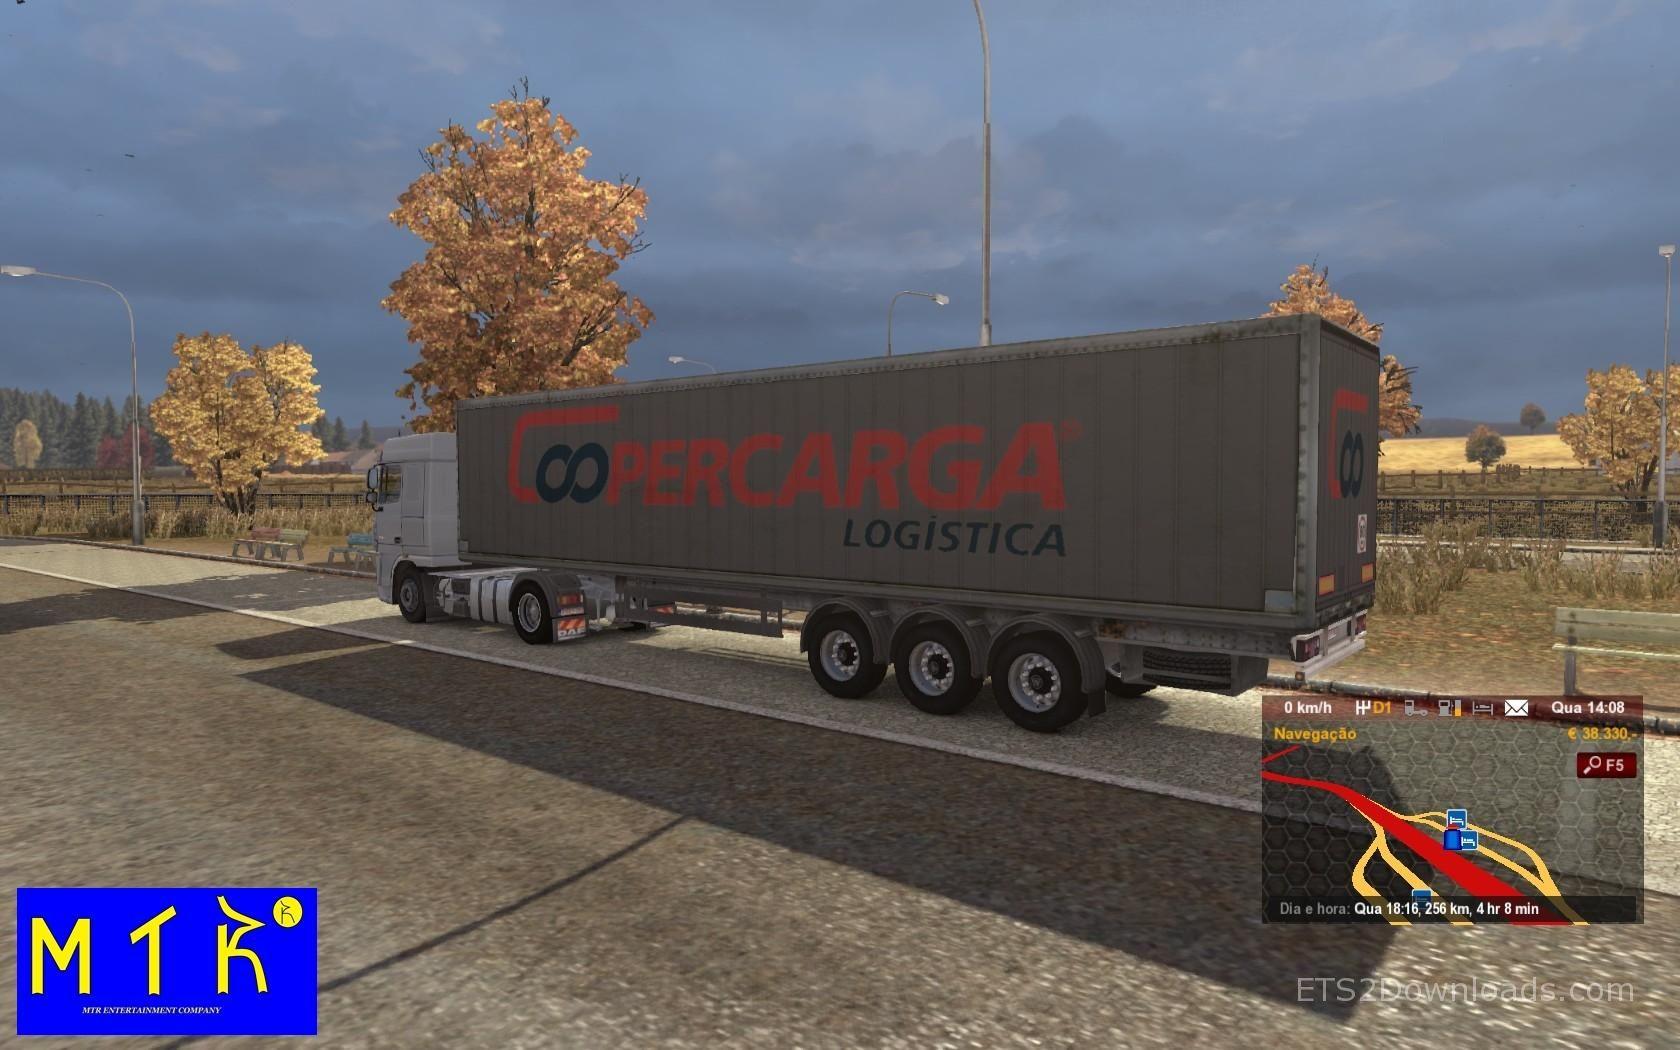 coopercarga-logistic-trailer-ets2-2